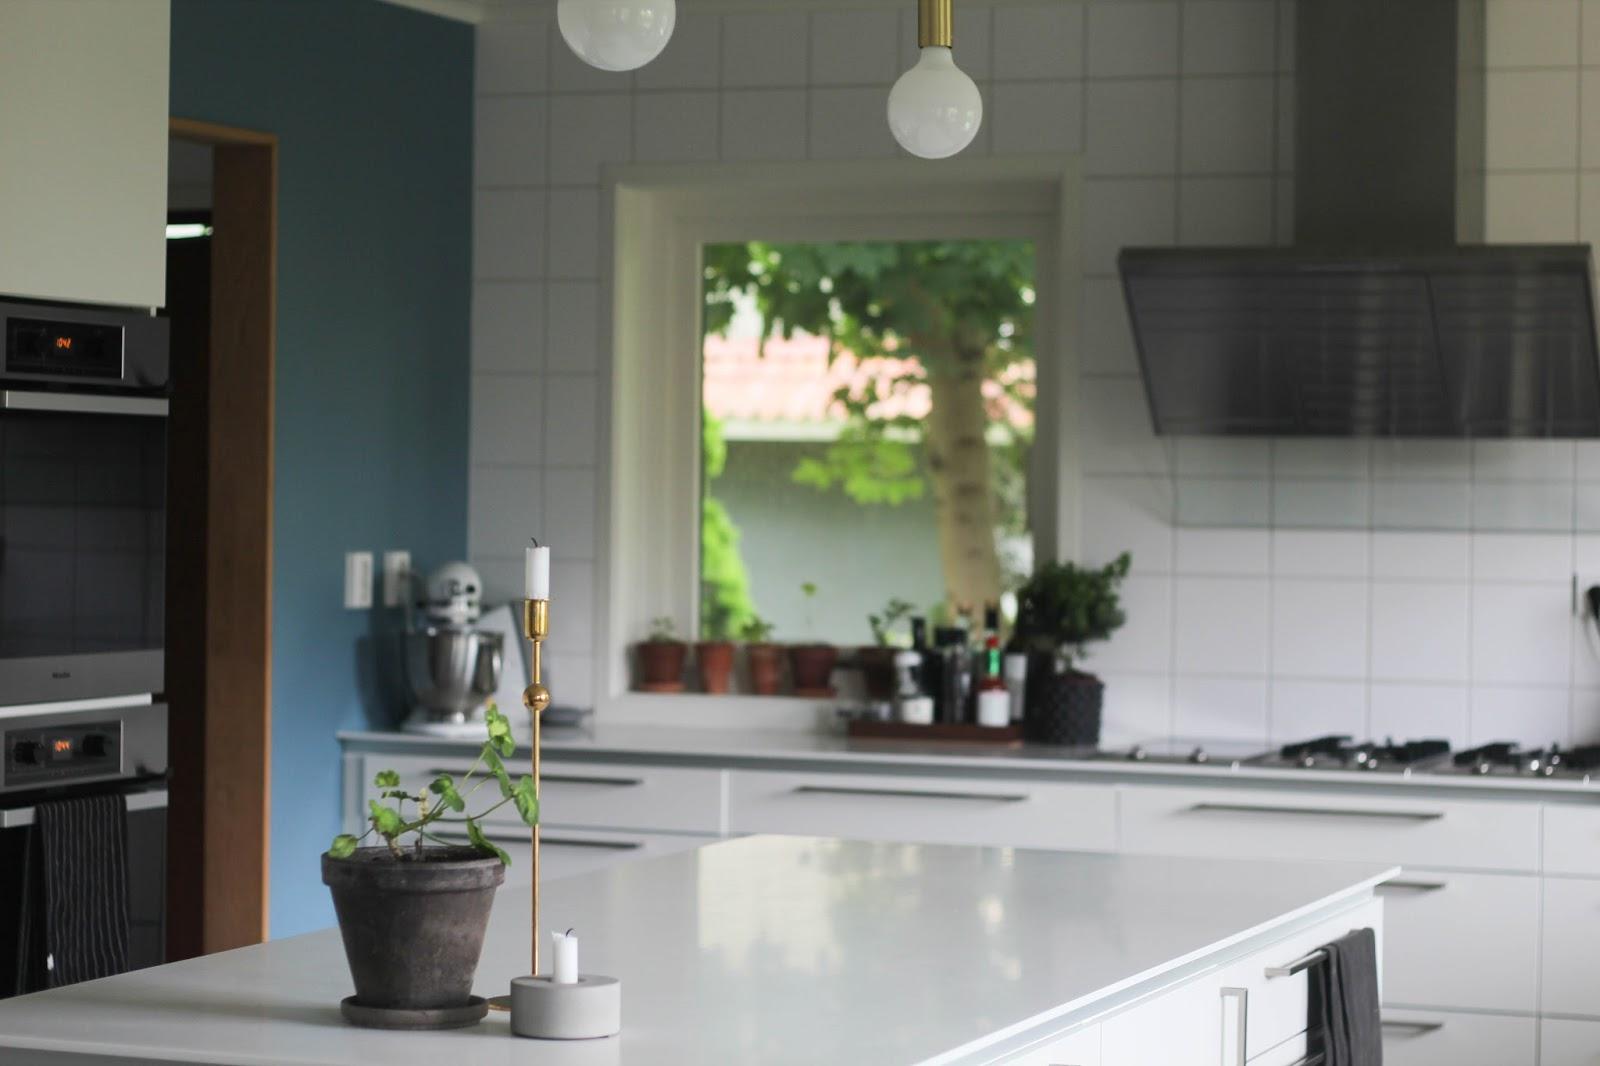 House Of Philia Halsans Kok : litet kok kokso  vort kok har vi en stor kokso och jag olskar